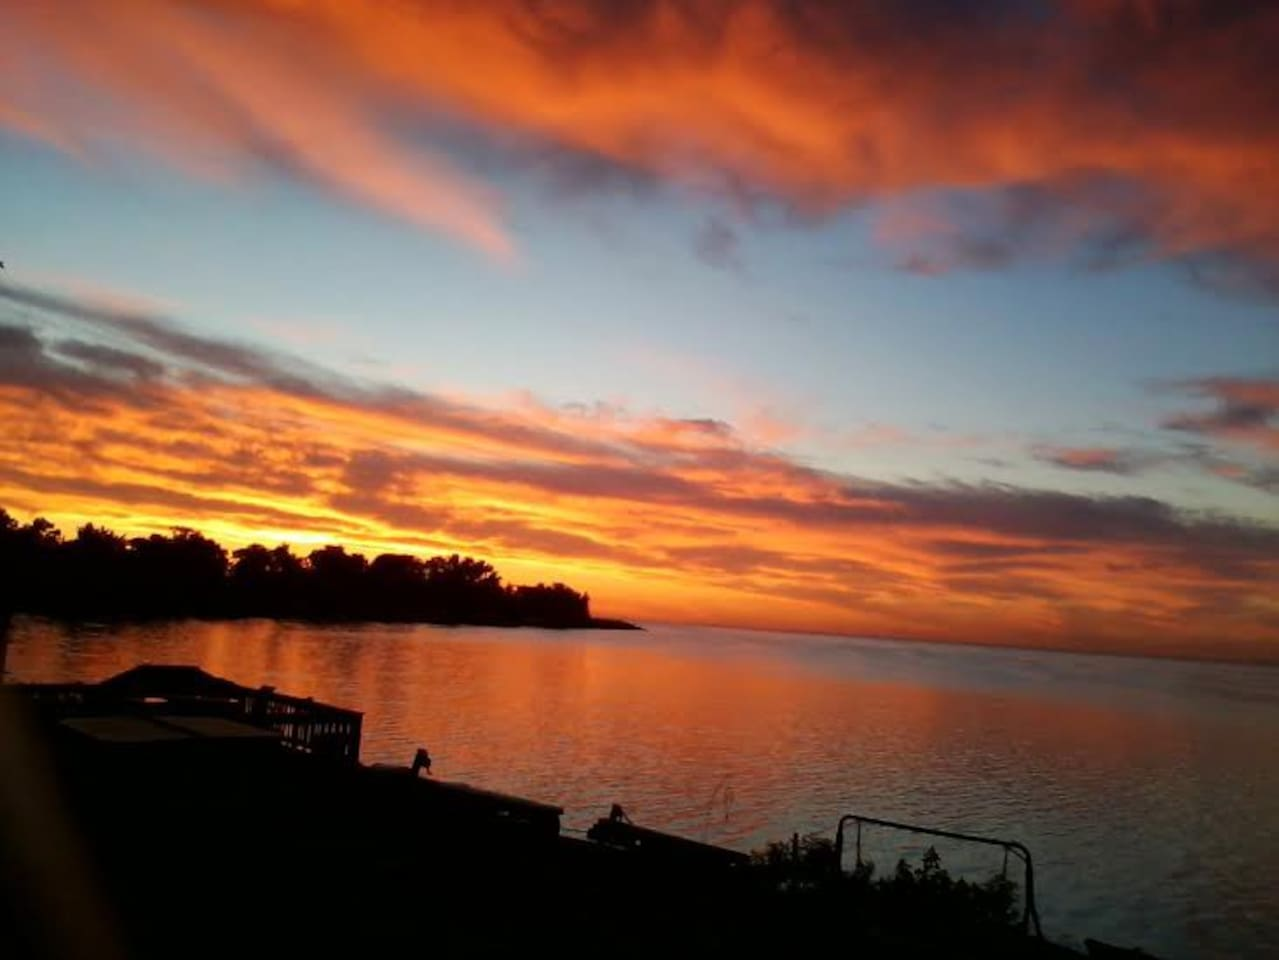 Sunrise over Maumee Bay, Lake Erie